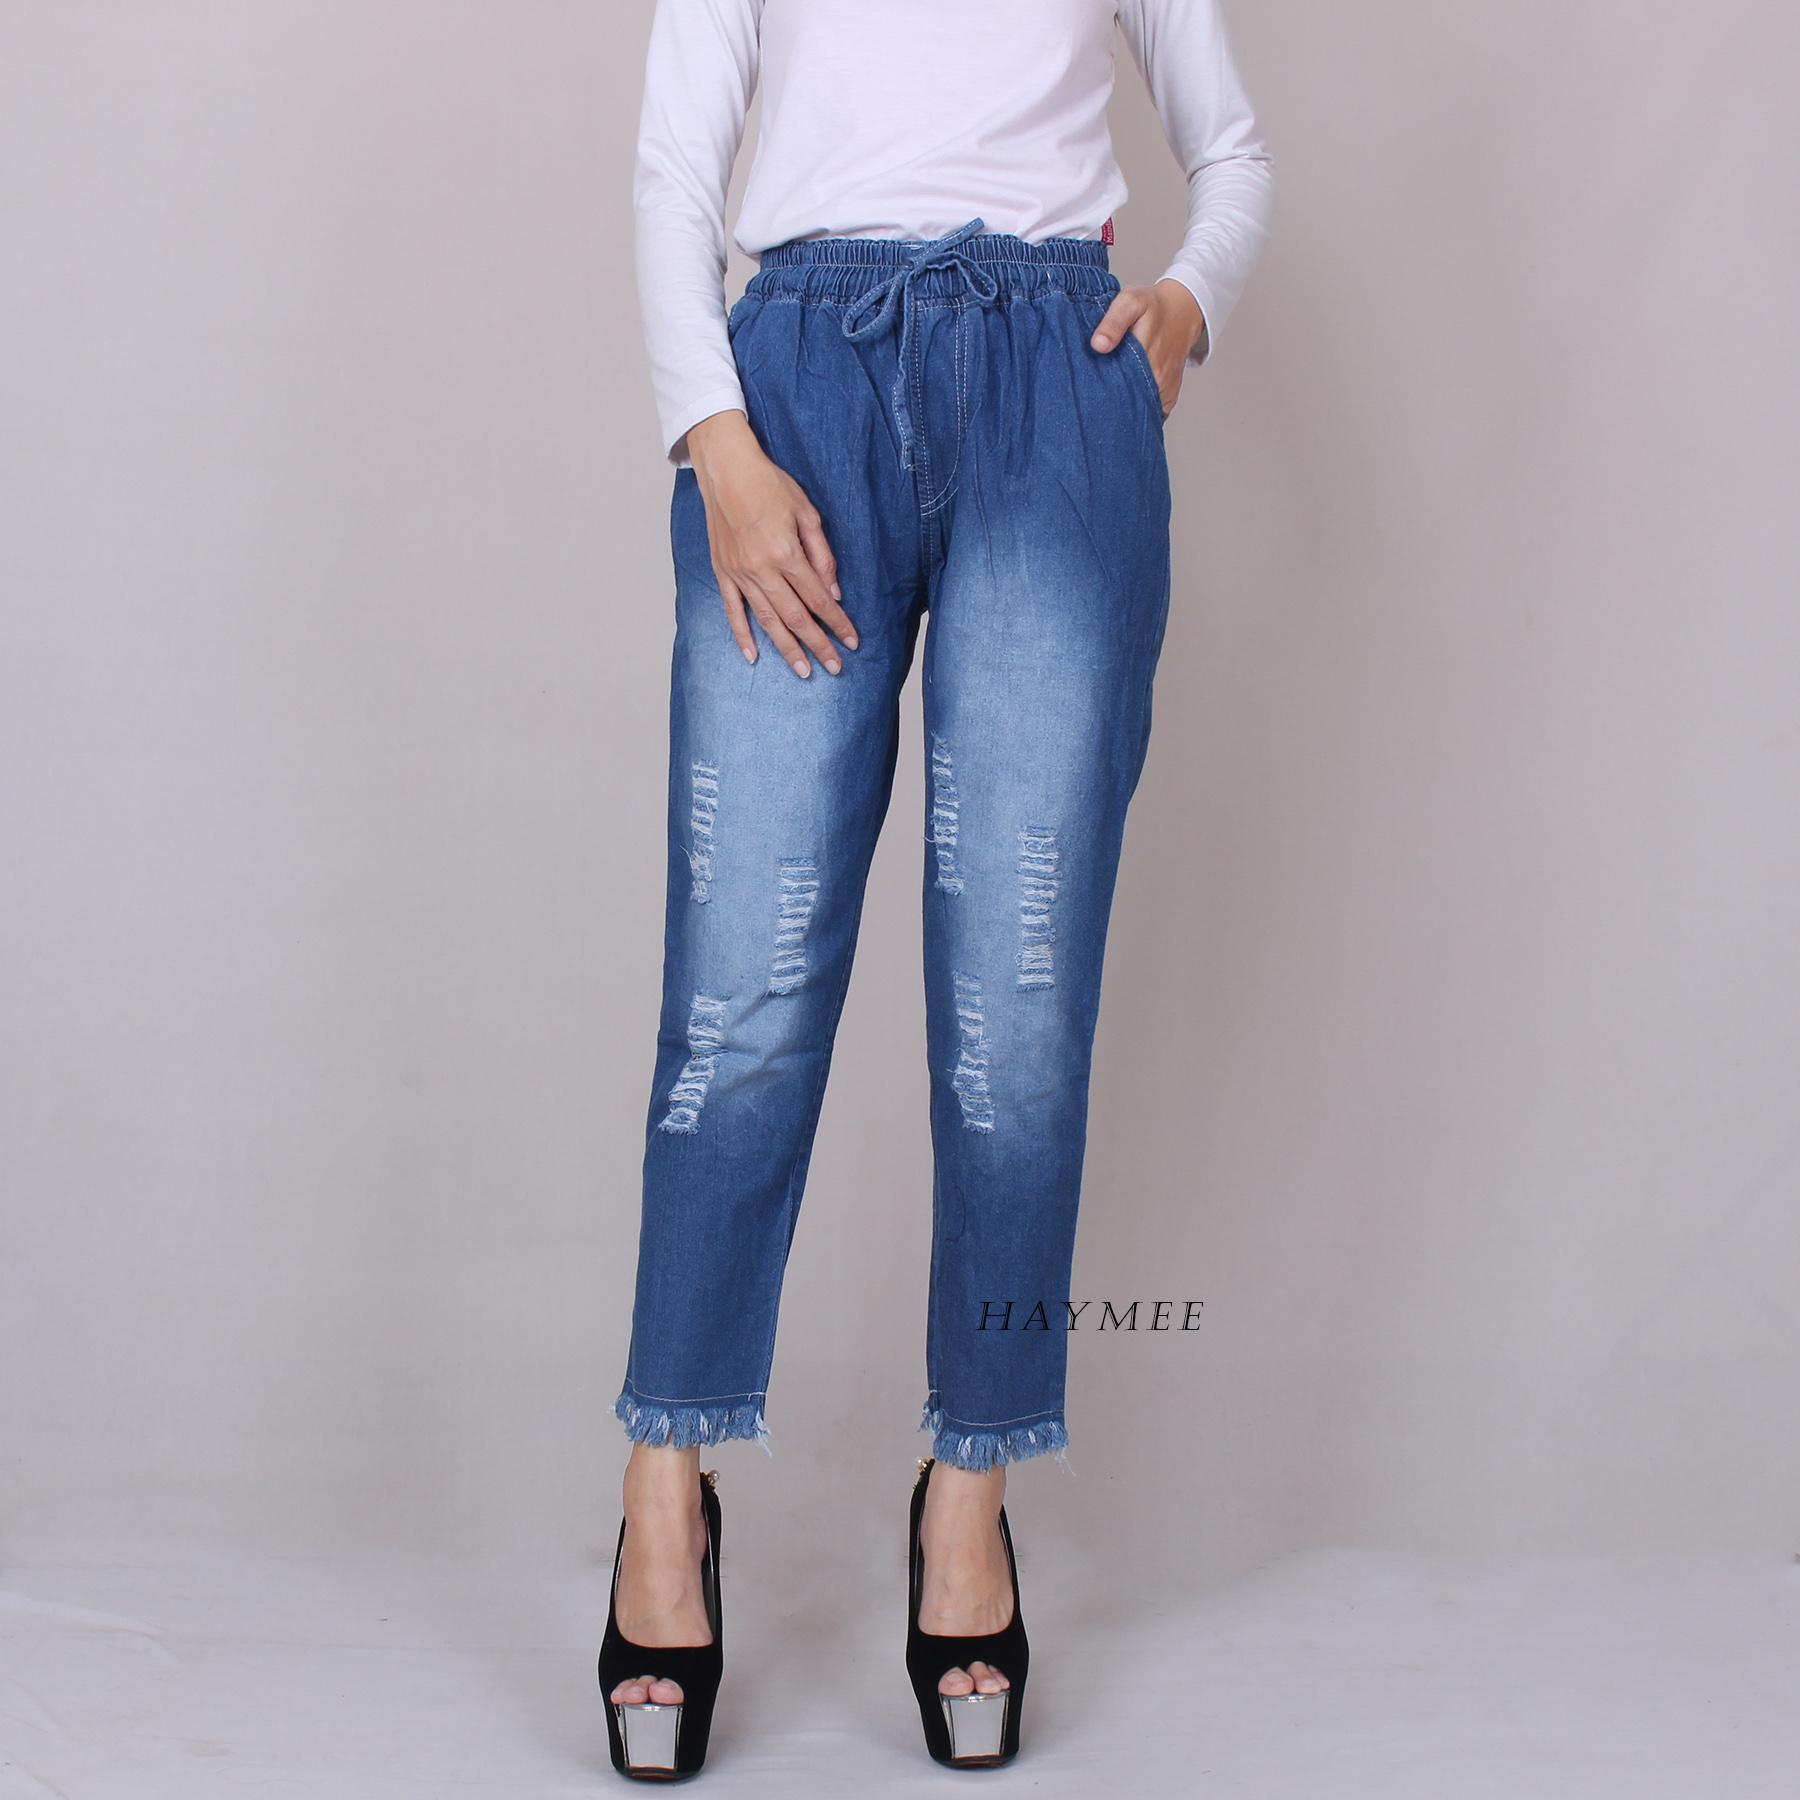 PERRIE Celana Riwis Boyfriend Bawahan Jeans Wanita Celana Denim Wanita Motif Sobek Blue